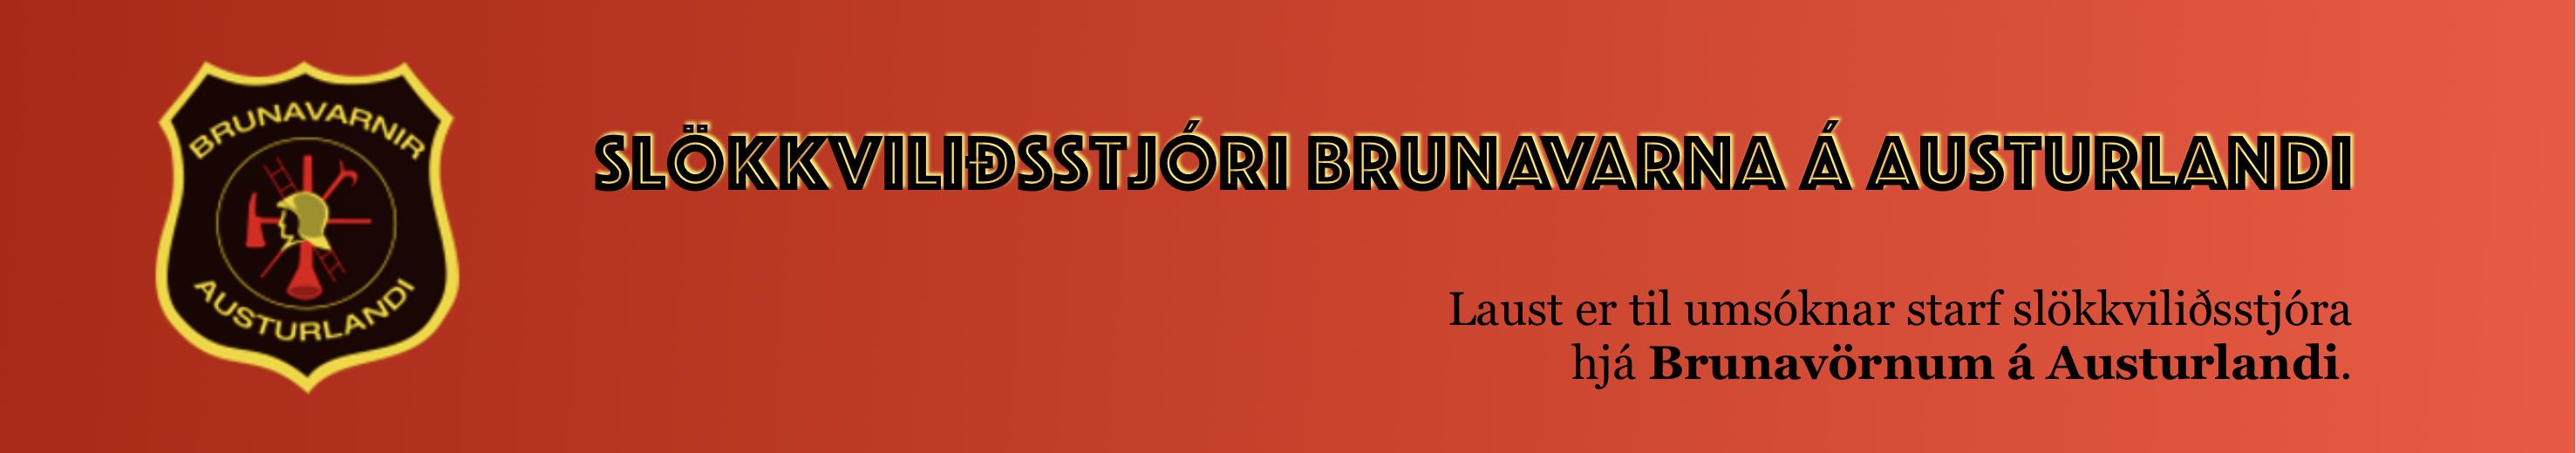 Brunavarnir Austurlands laust starf 2019